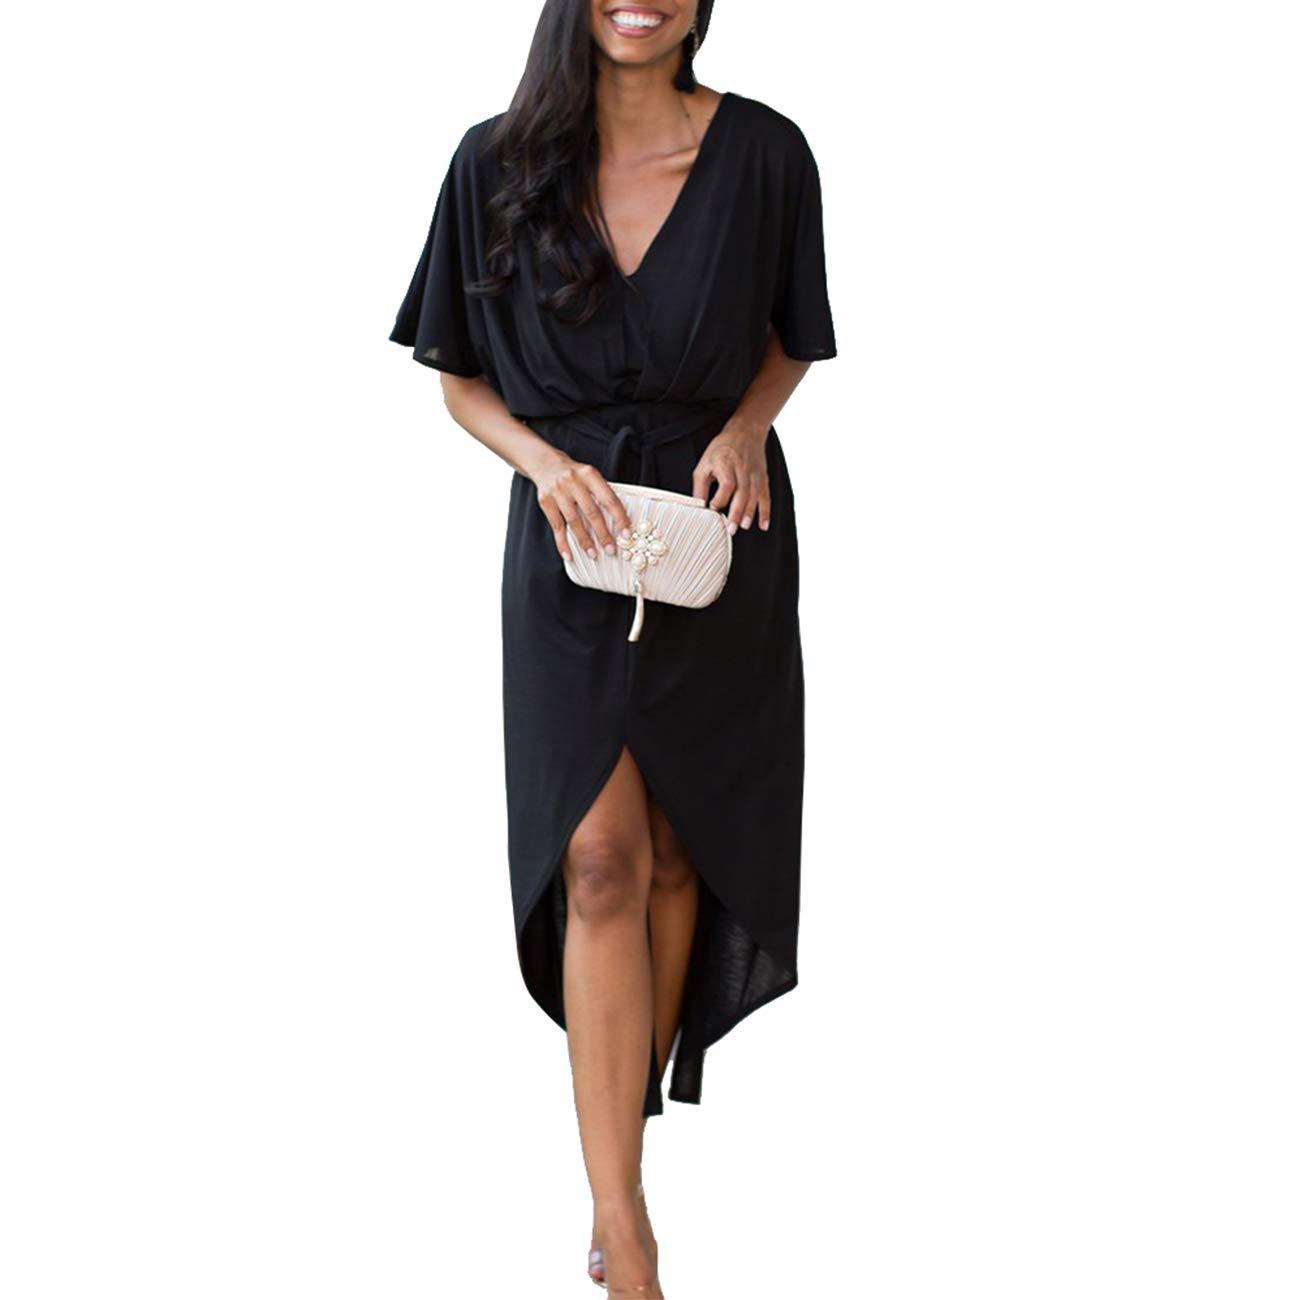 Black Devon Aoki Women Casual Sexy Maxi Dress Spring Summer 2019 Style V Neck Ladies Dresses Womens Clothing AnkleLength Split Hem Dress Black